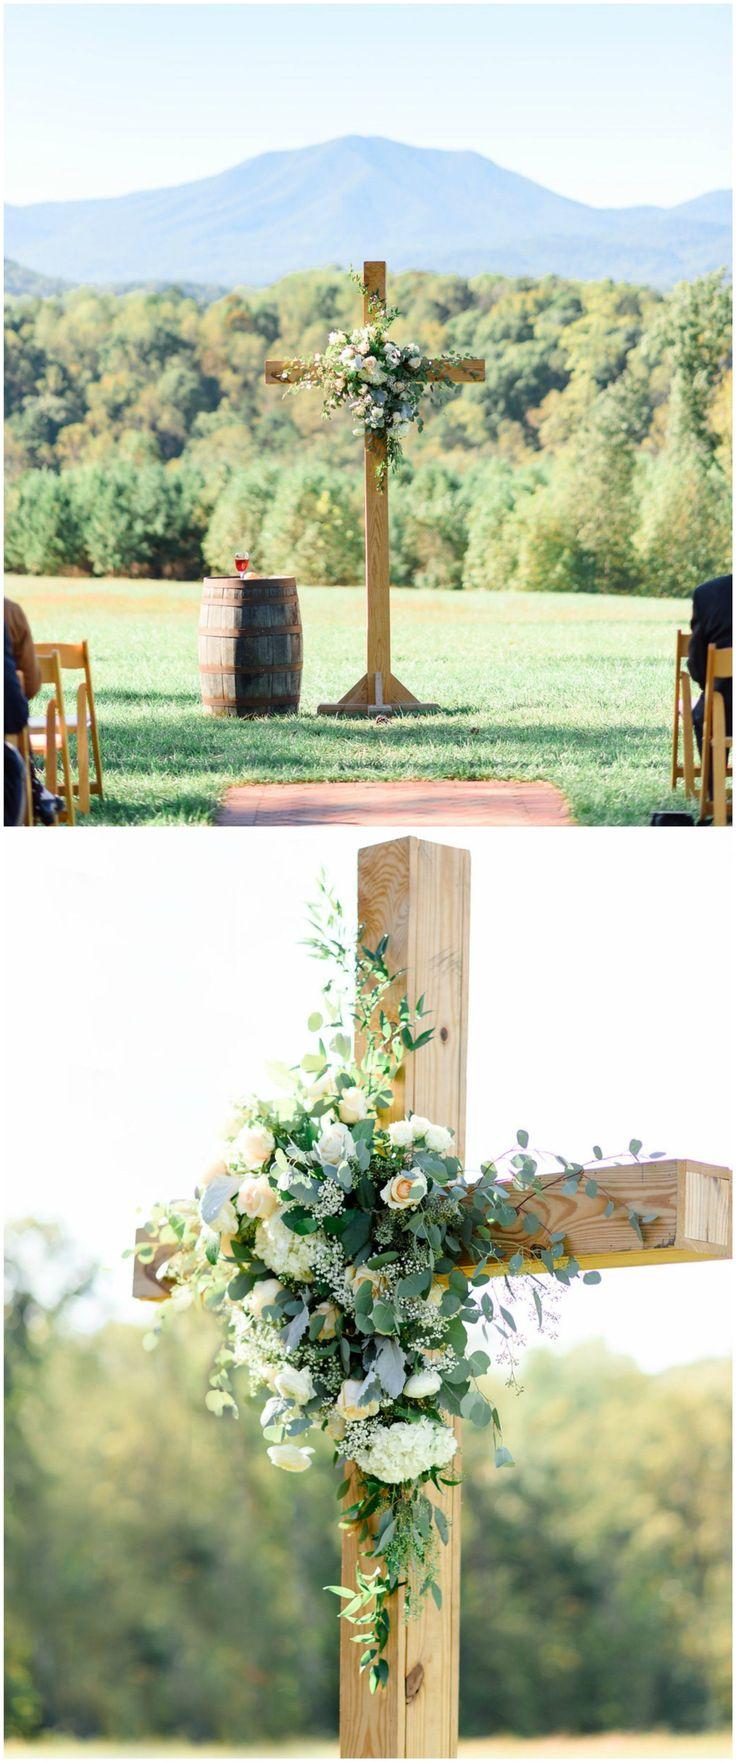 Wedding venues in virginia beach va   best Virginia Wedding images on Pinterest  Wedding ideas